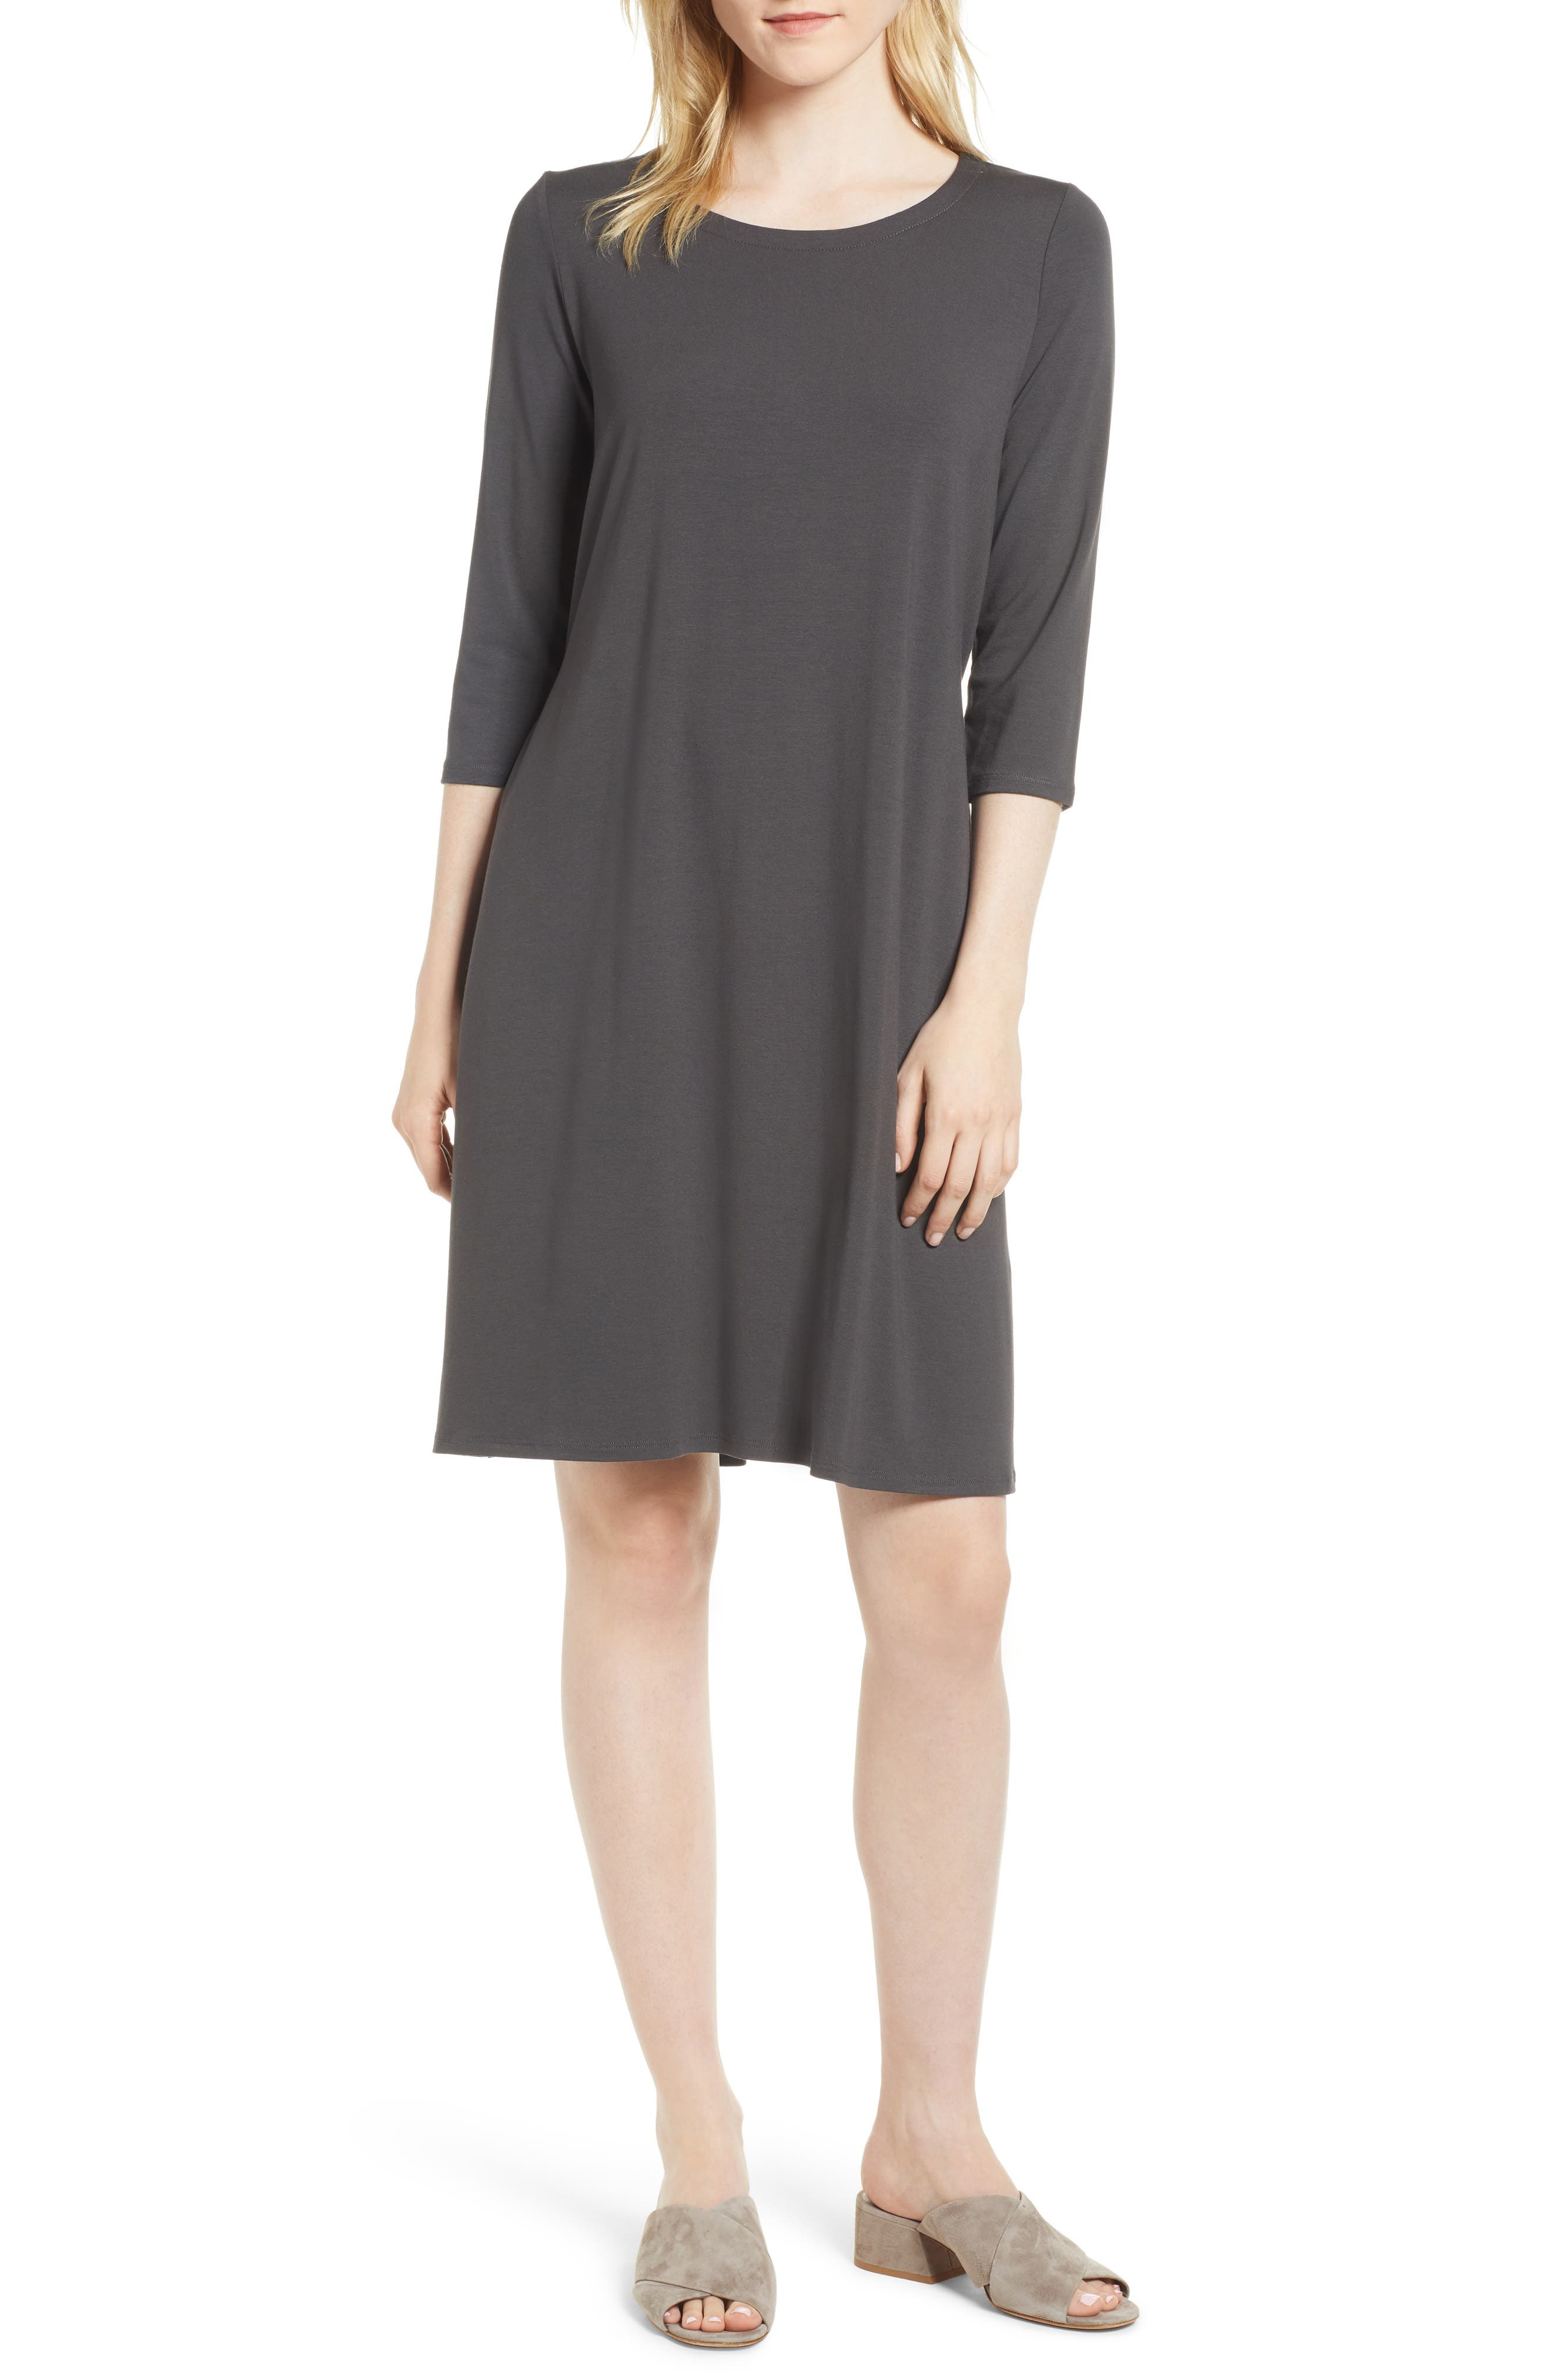 Alternate Image 1 Selected - Eileen Fisher Tie Back Dress (Regular & Petite)